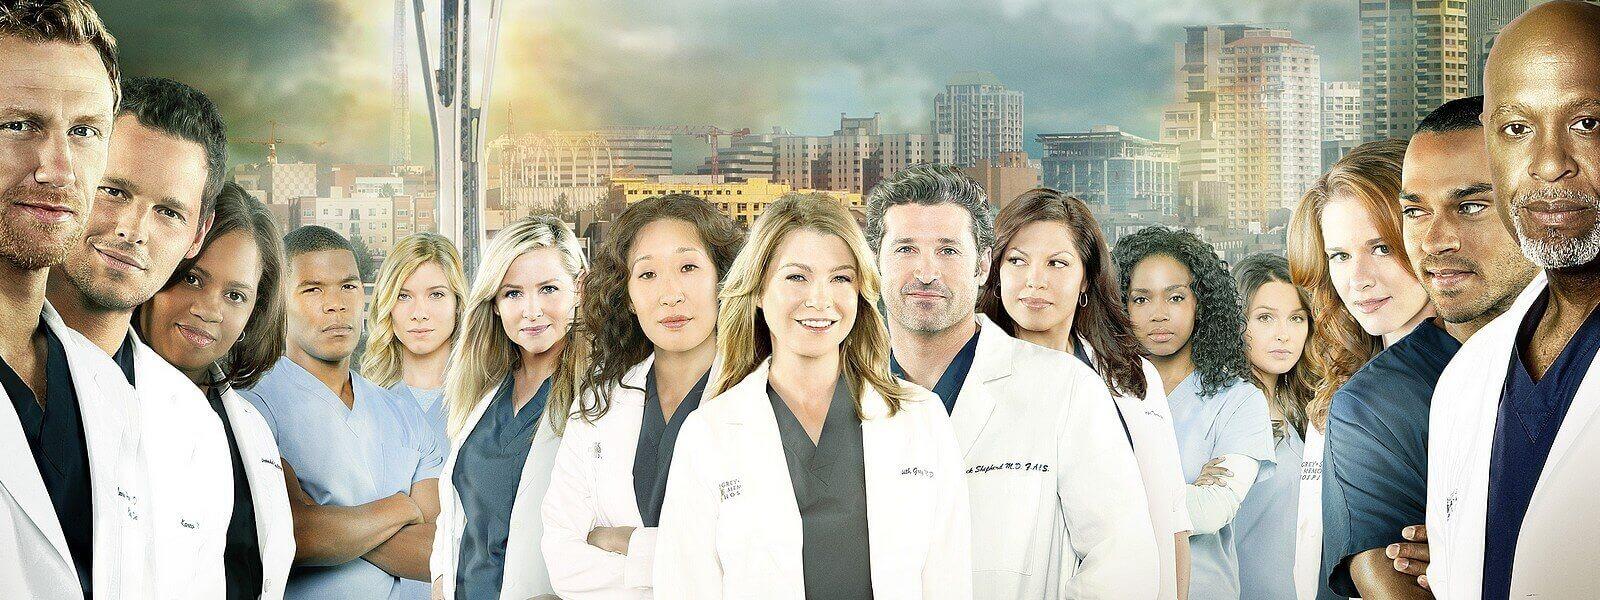 Kinox Greys Anatomy Staffel 11 Deutsch